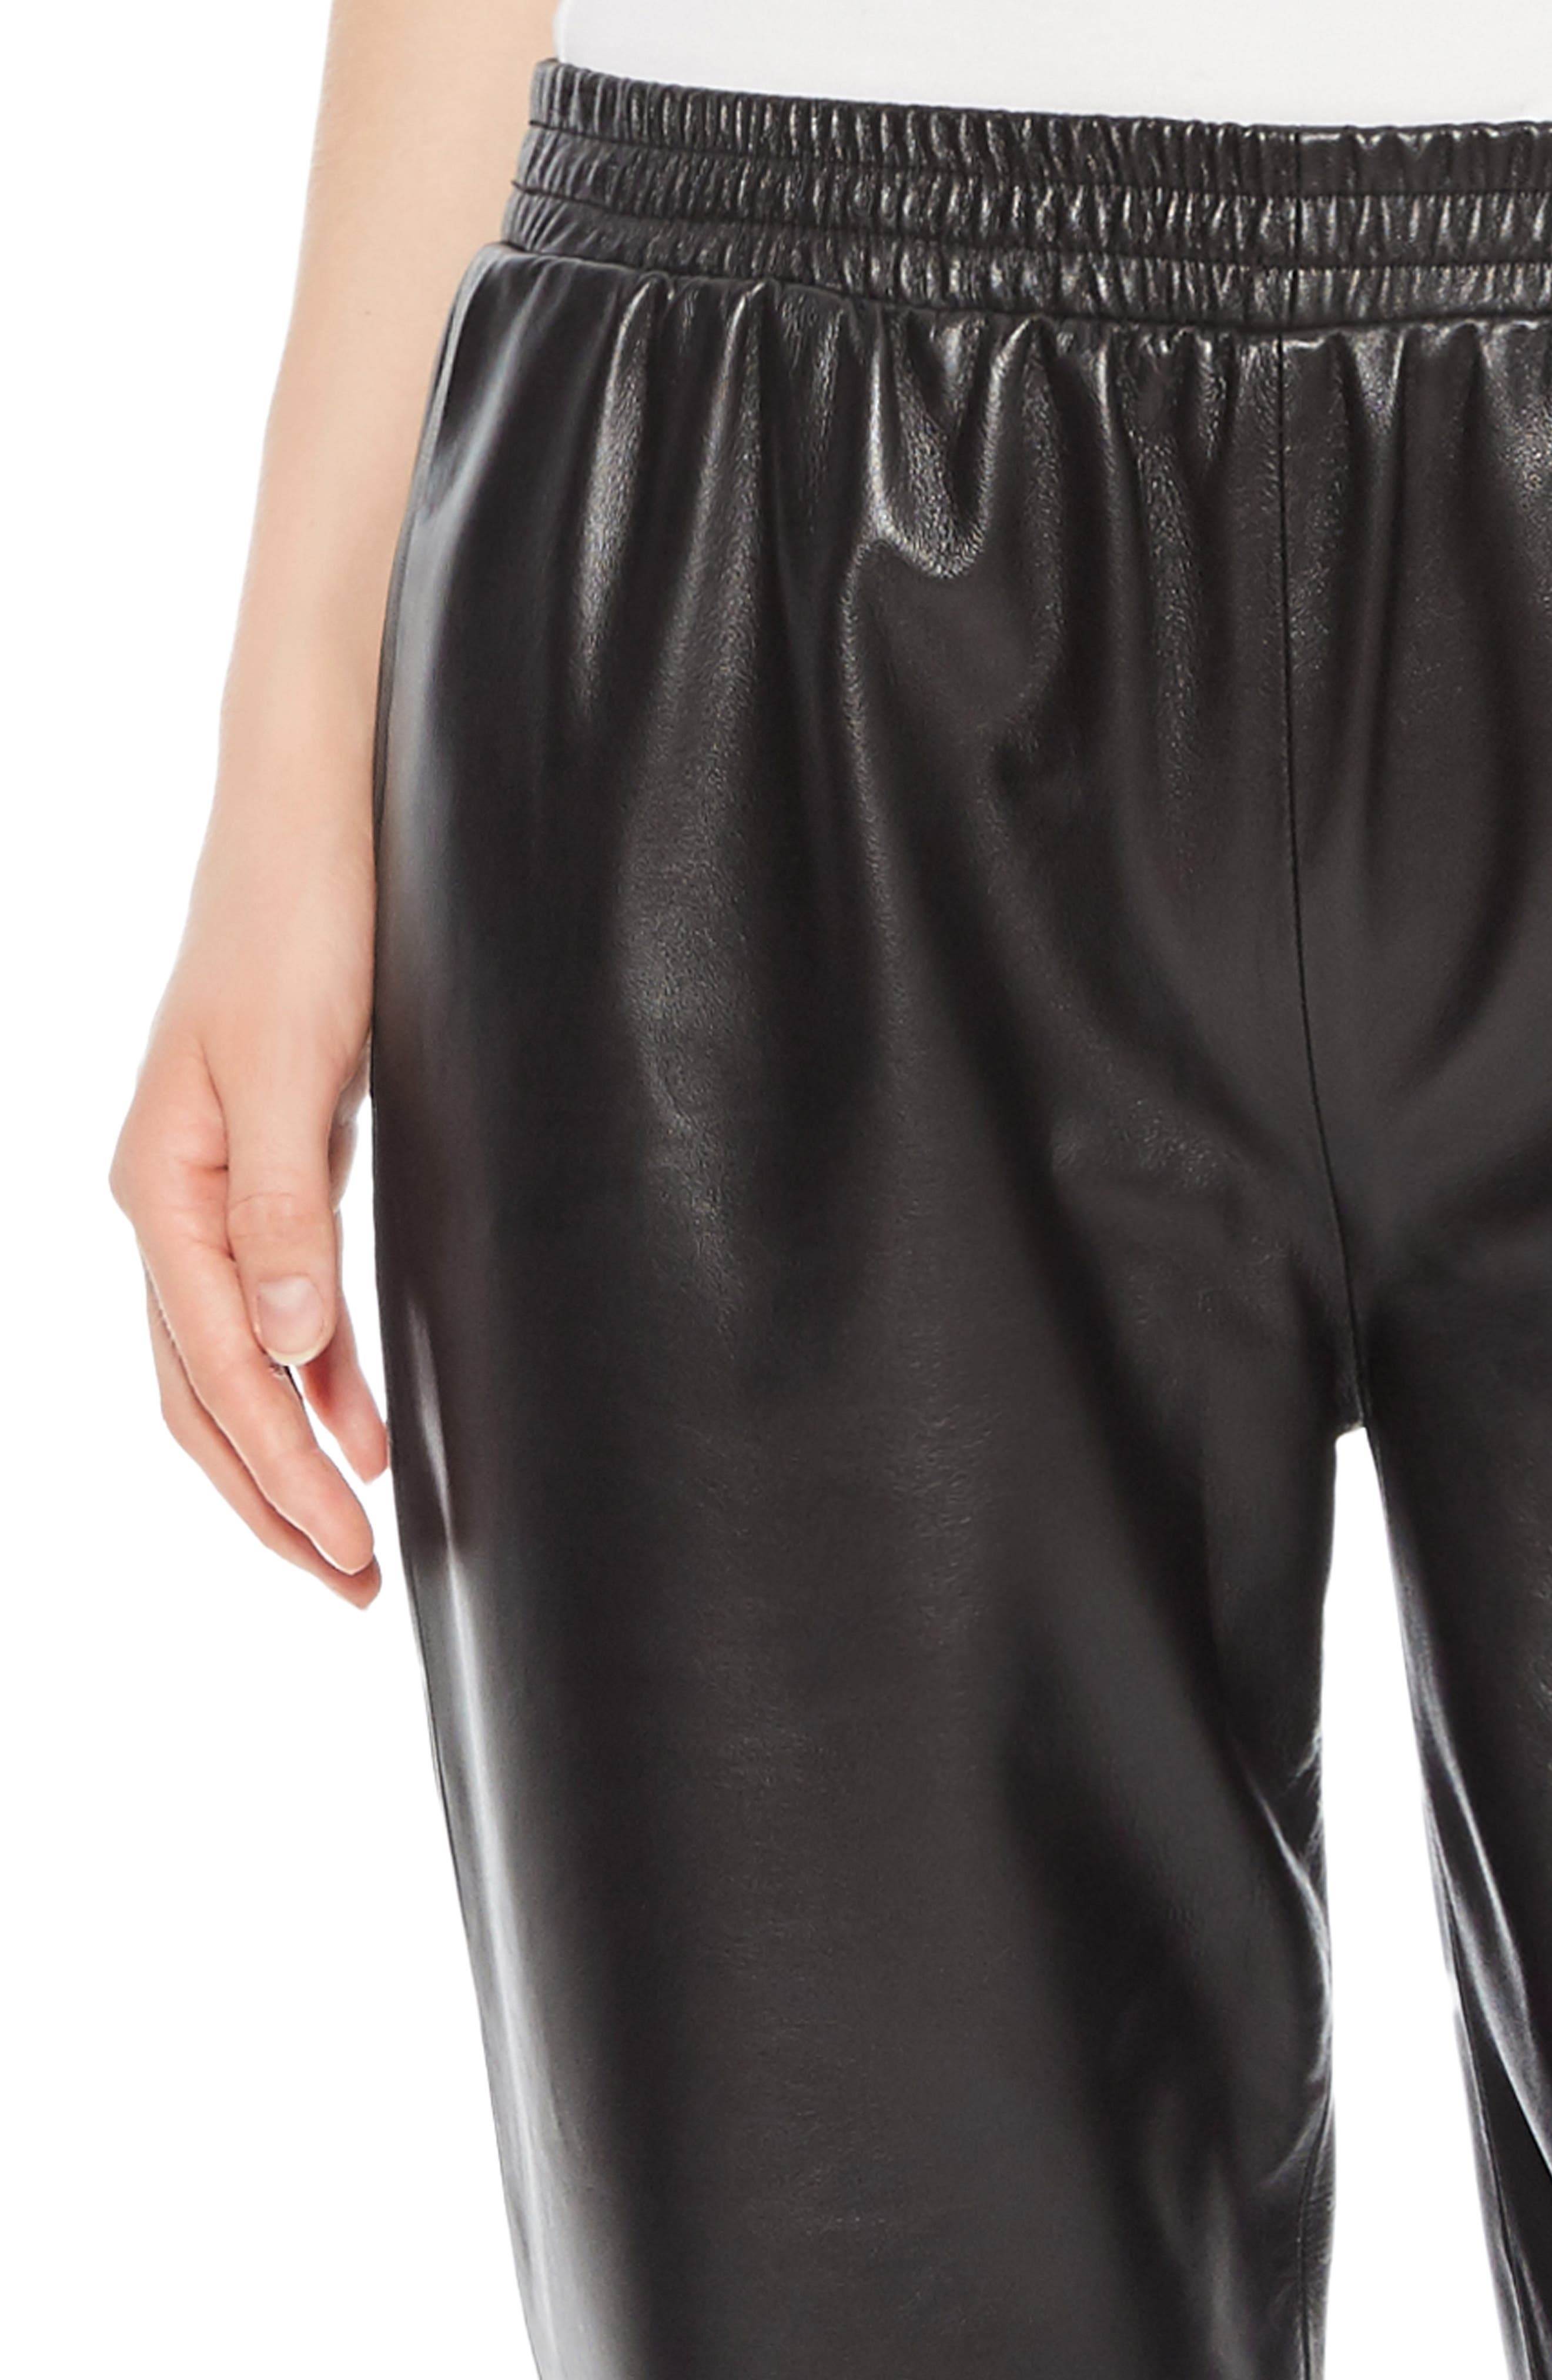 Eavan Leather Jogger Pants,                             Alternate thumbnail 4, color,                             001